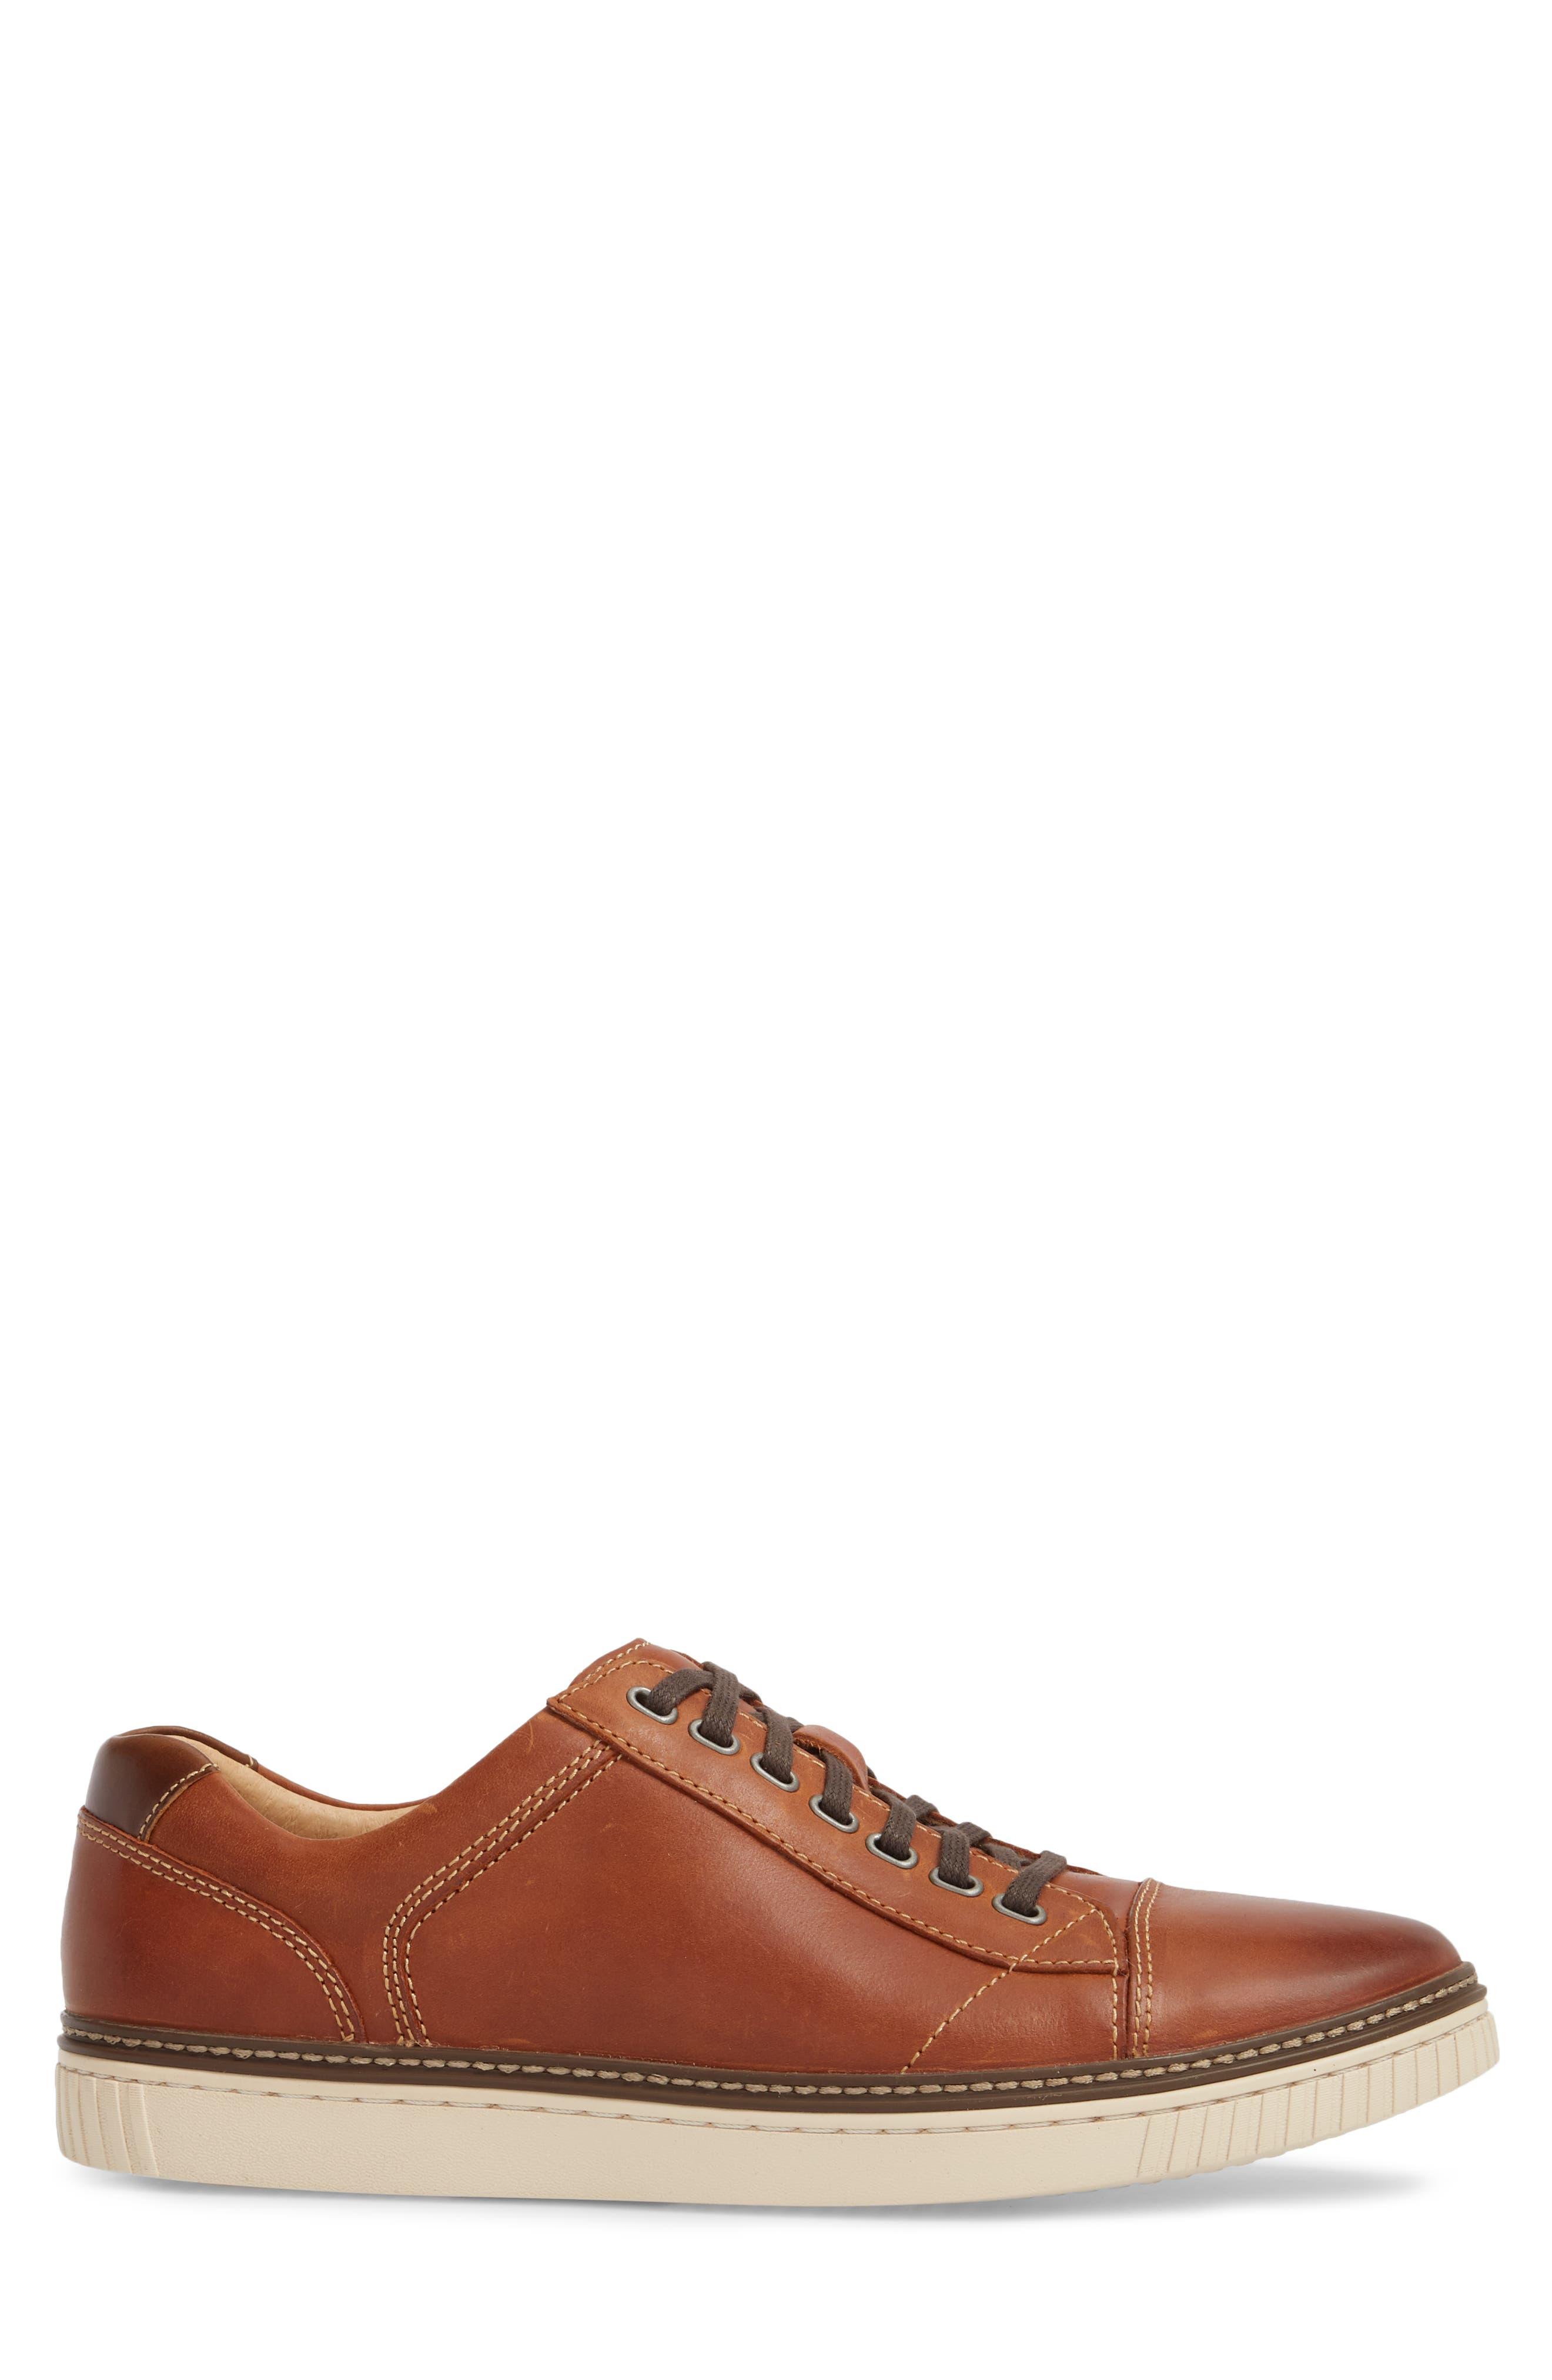 Wallace Low Top Sneaker,                             Alternate thumbnail 3, color,                             Tan Nubuck